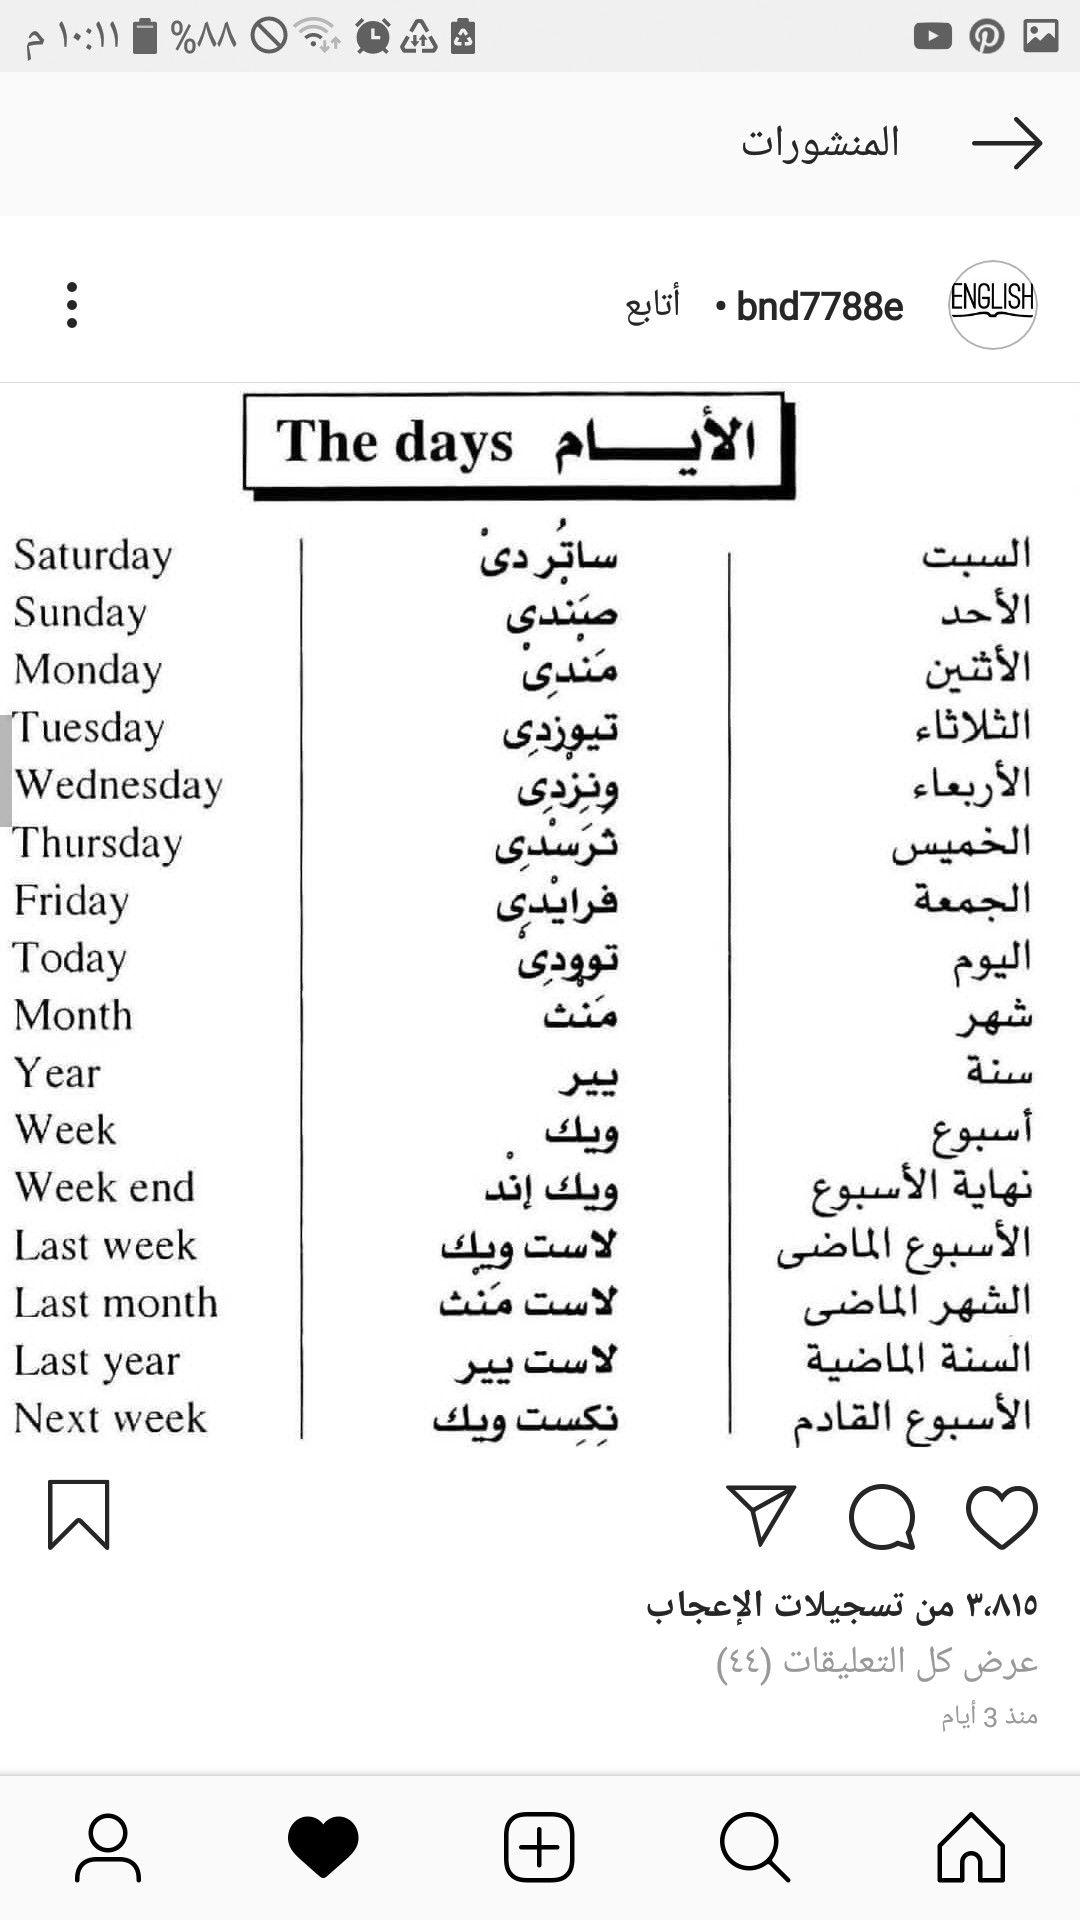 Learning Arabic Msa Fabiennem English Phrases Learn English Words English Vocabulary Words